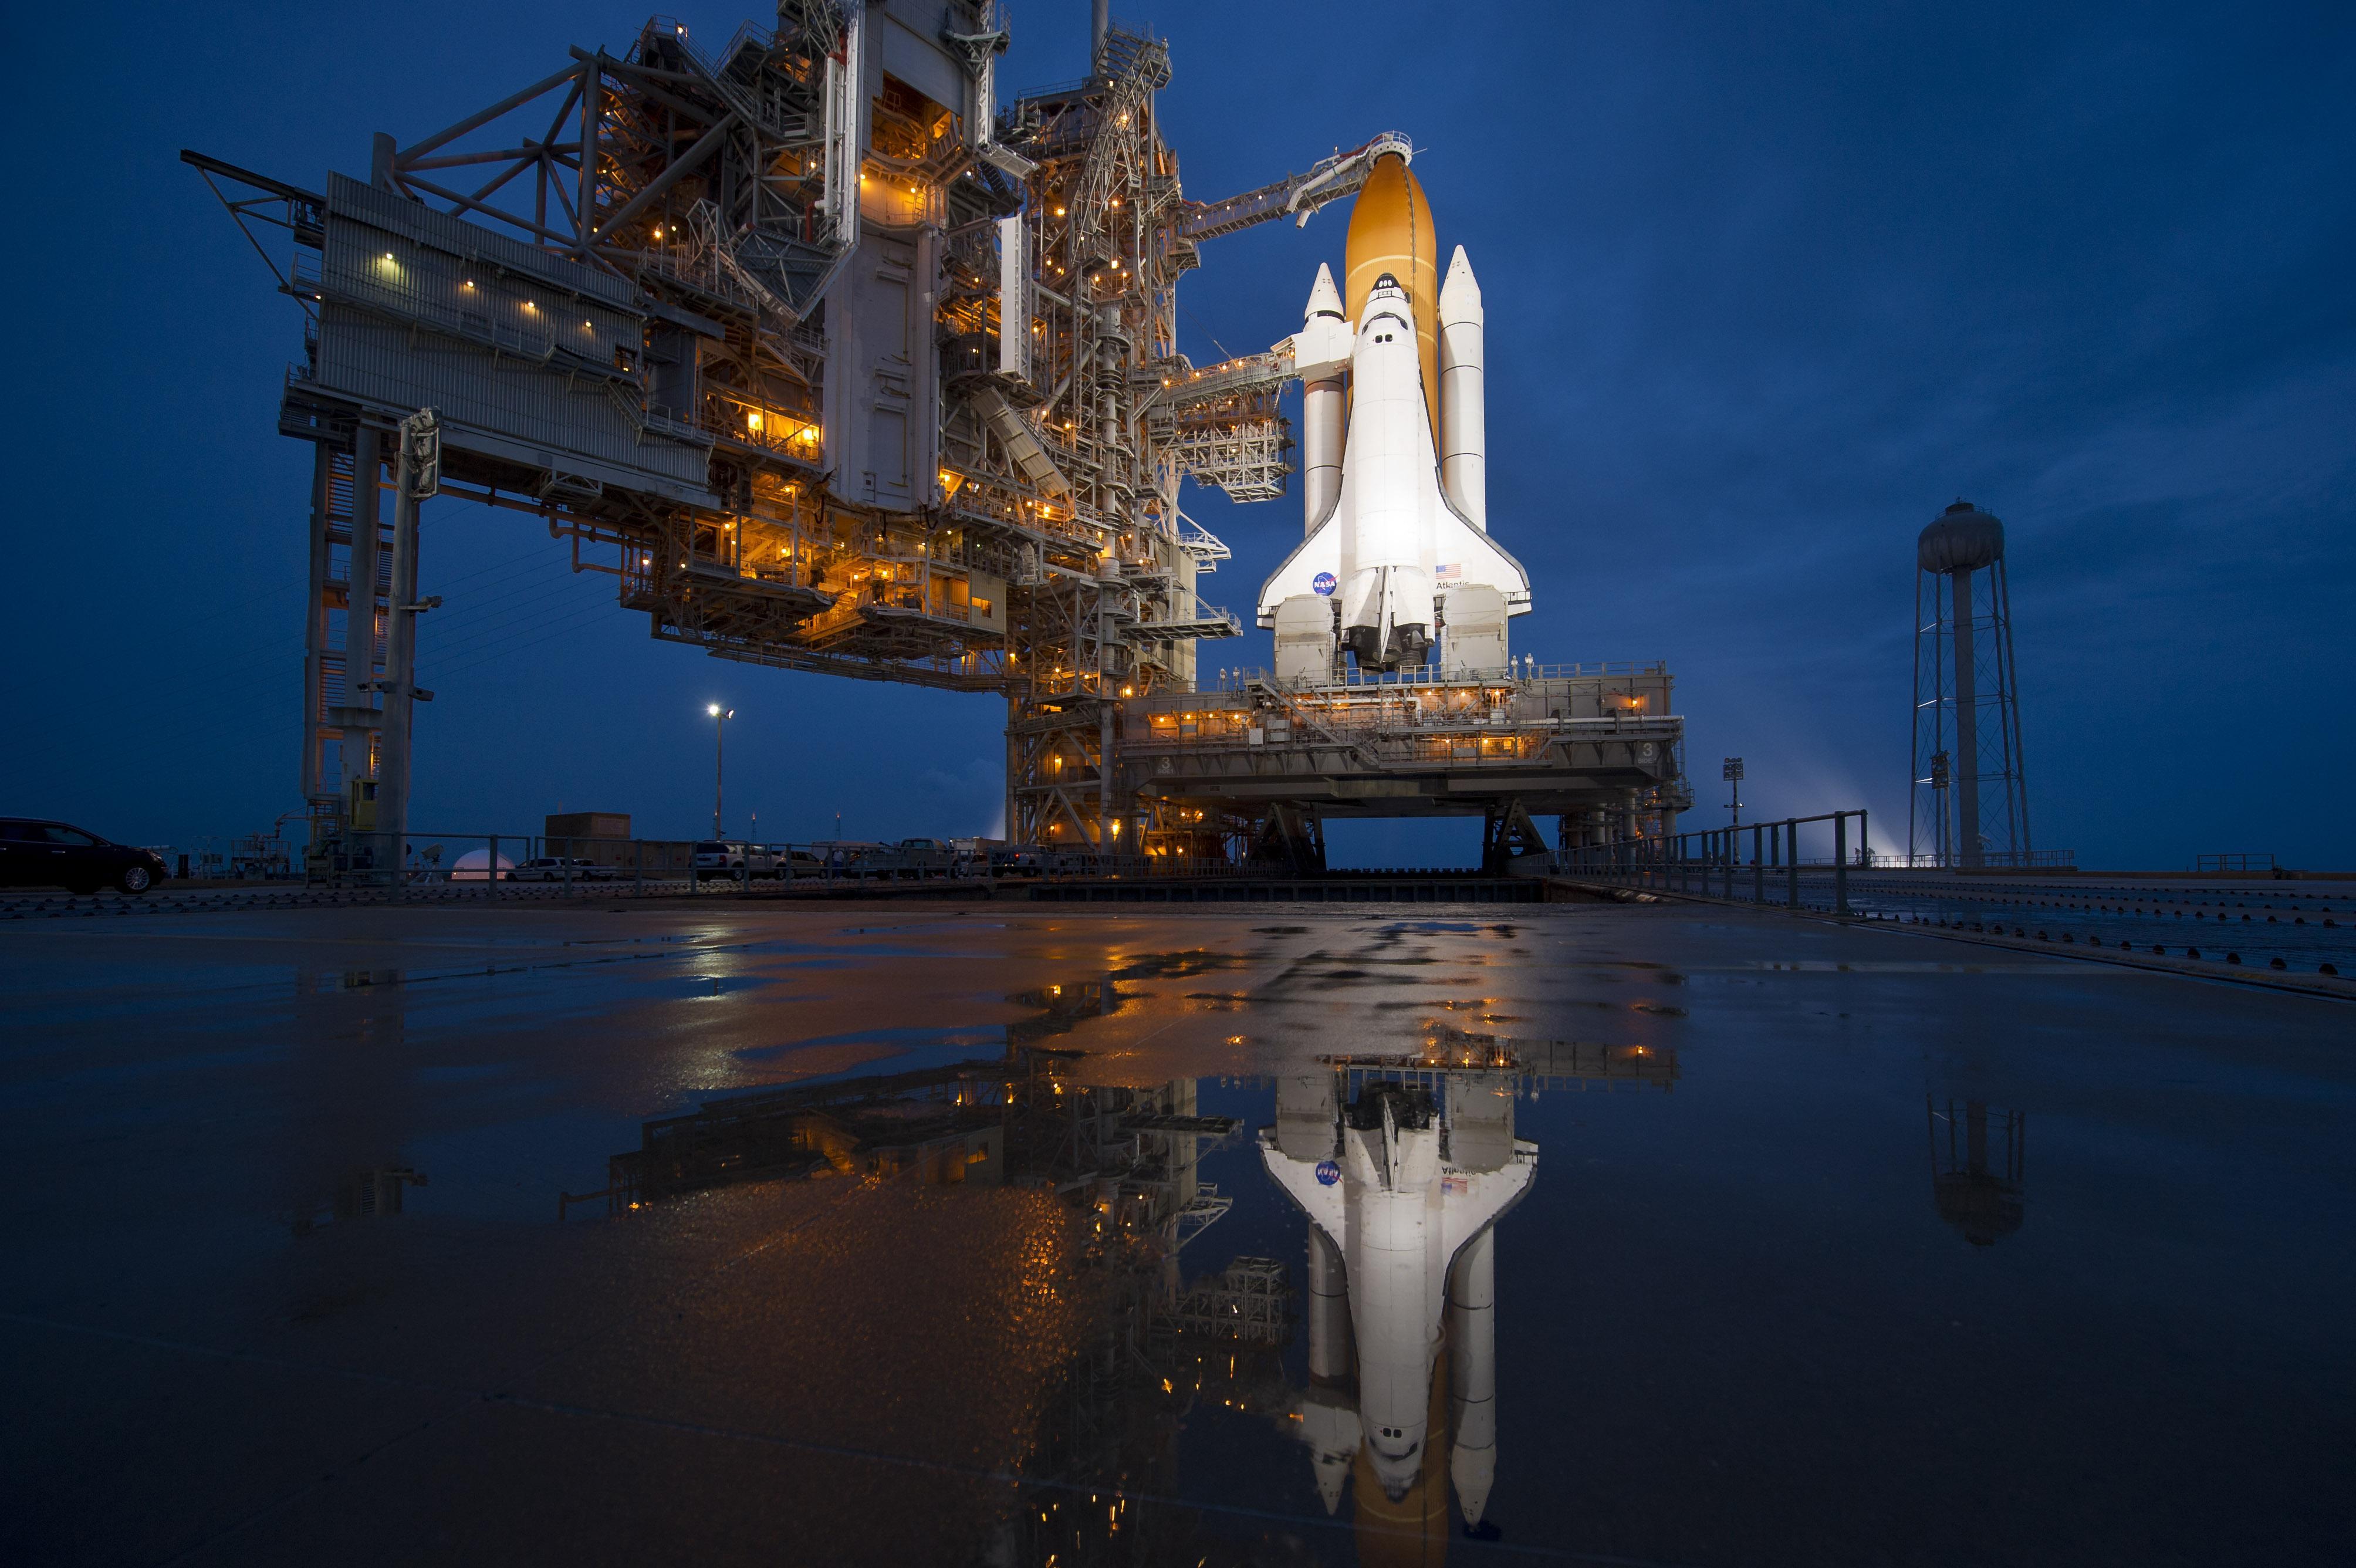 Shuttle Atlantis Takeoff Shuttle Atlantis at Launch Pad